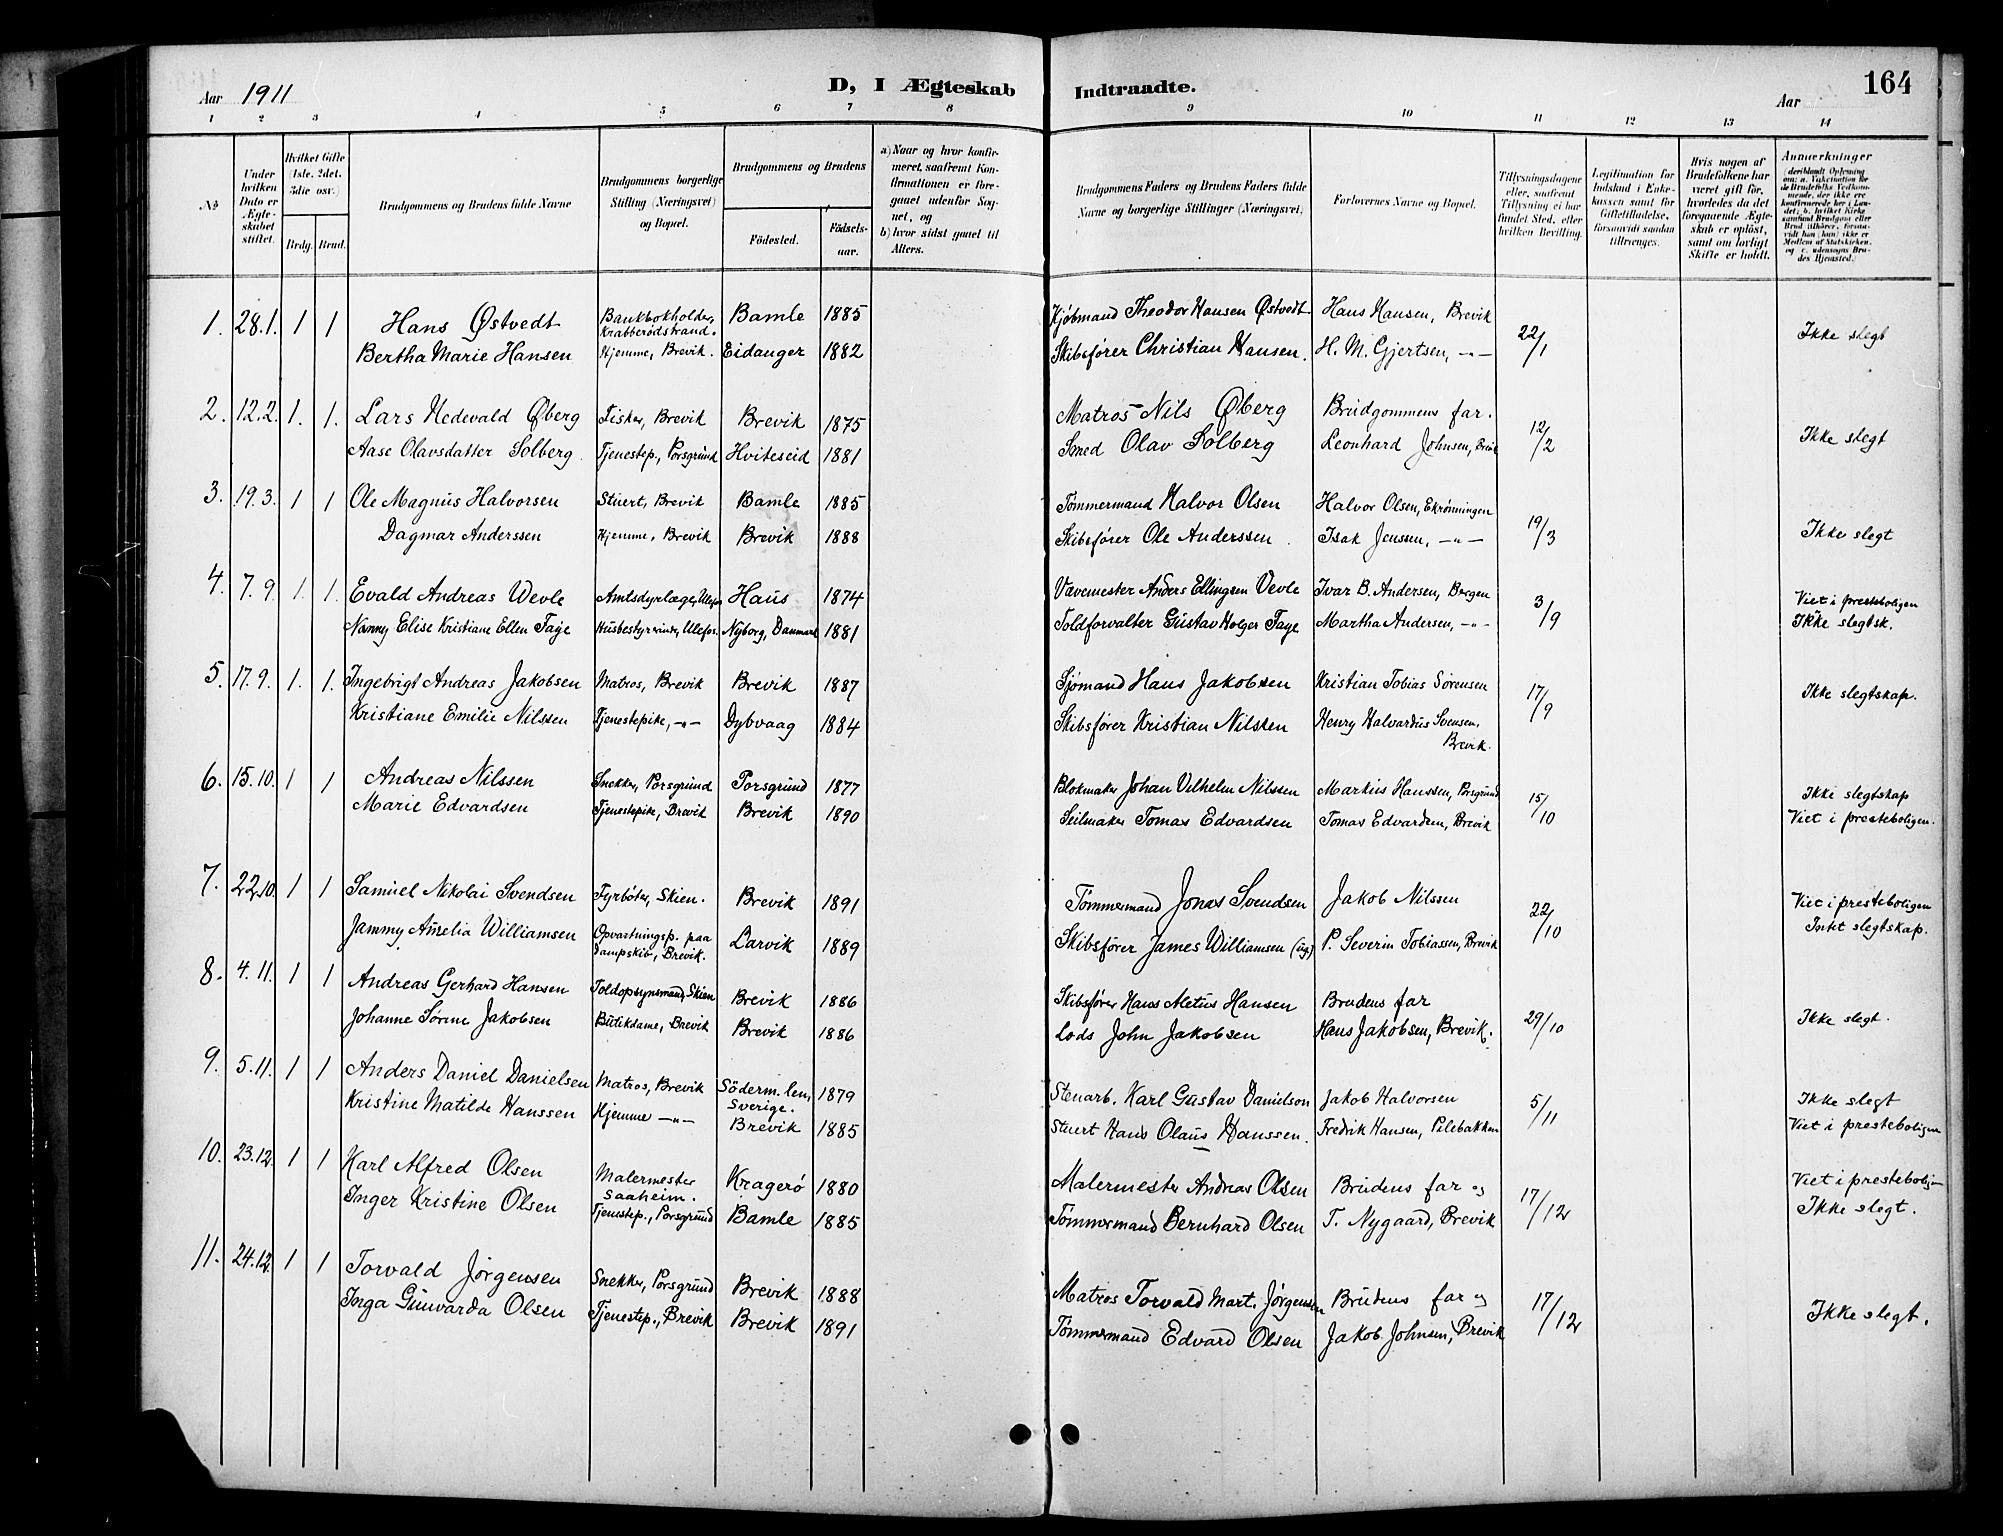 SAKO, Brevik kirkebøker, G/Ga/L0005: Klokkerbok nr. 5, 1901-1924, s. 164